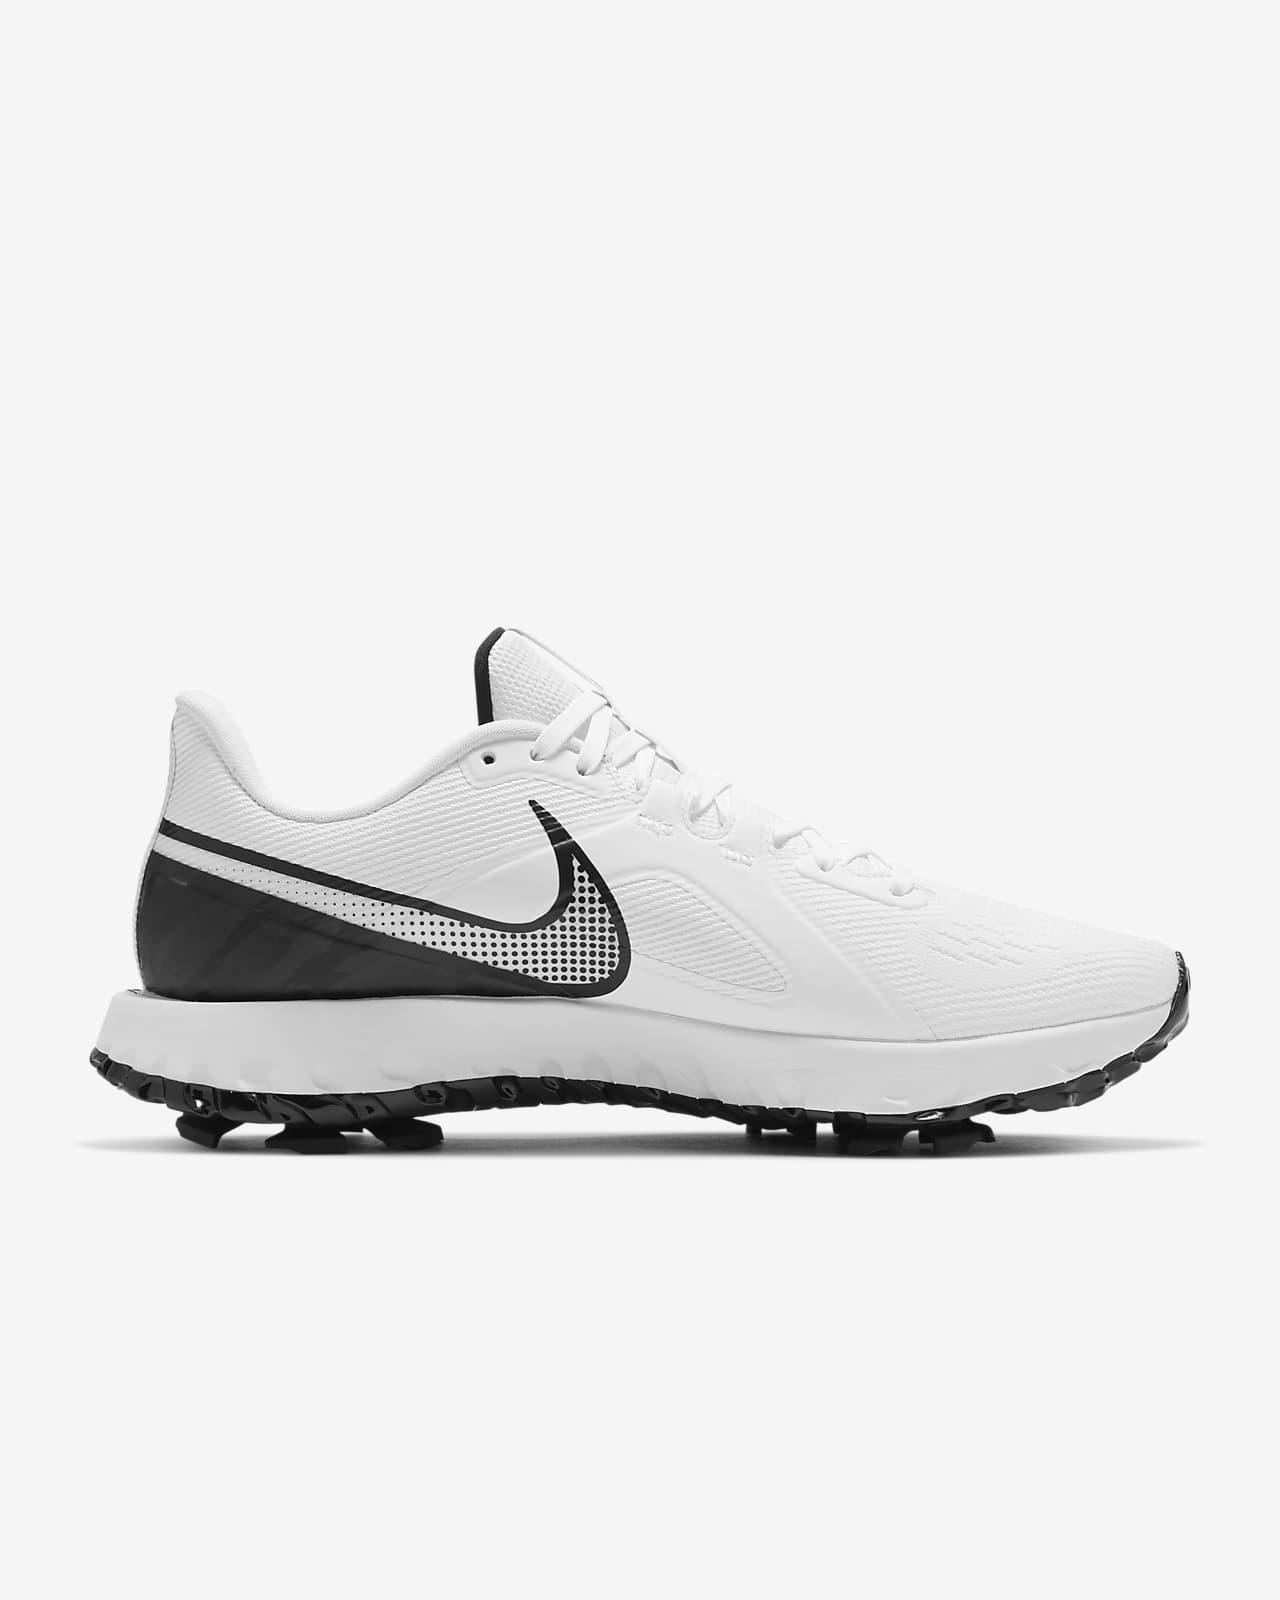 Nike React Infinity Pro Golf Shoe (Wide